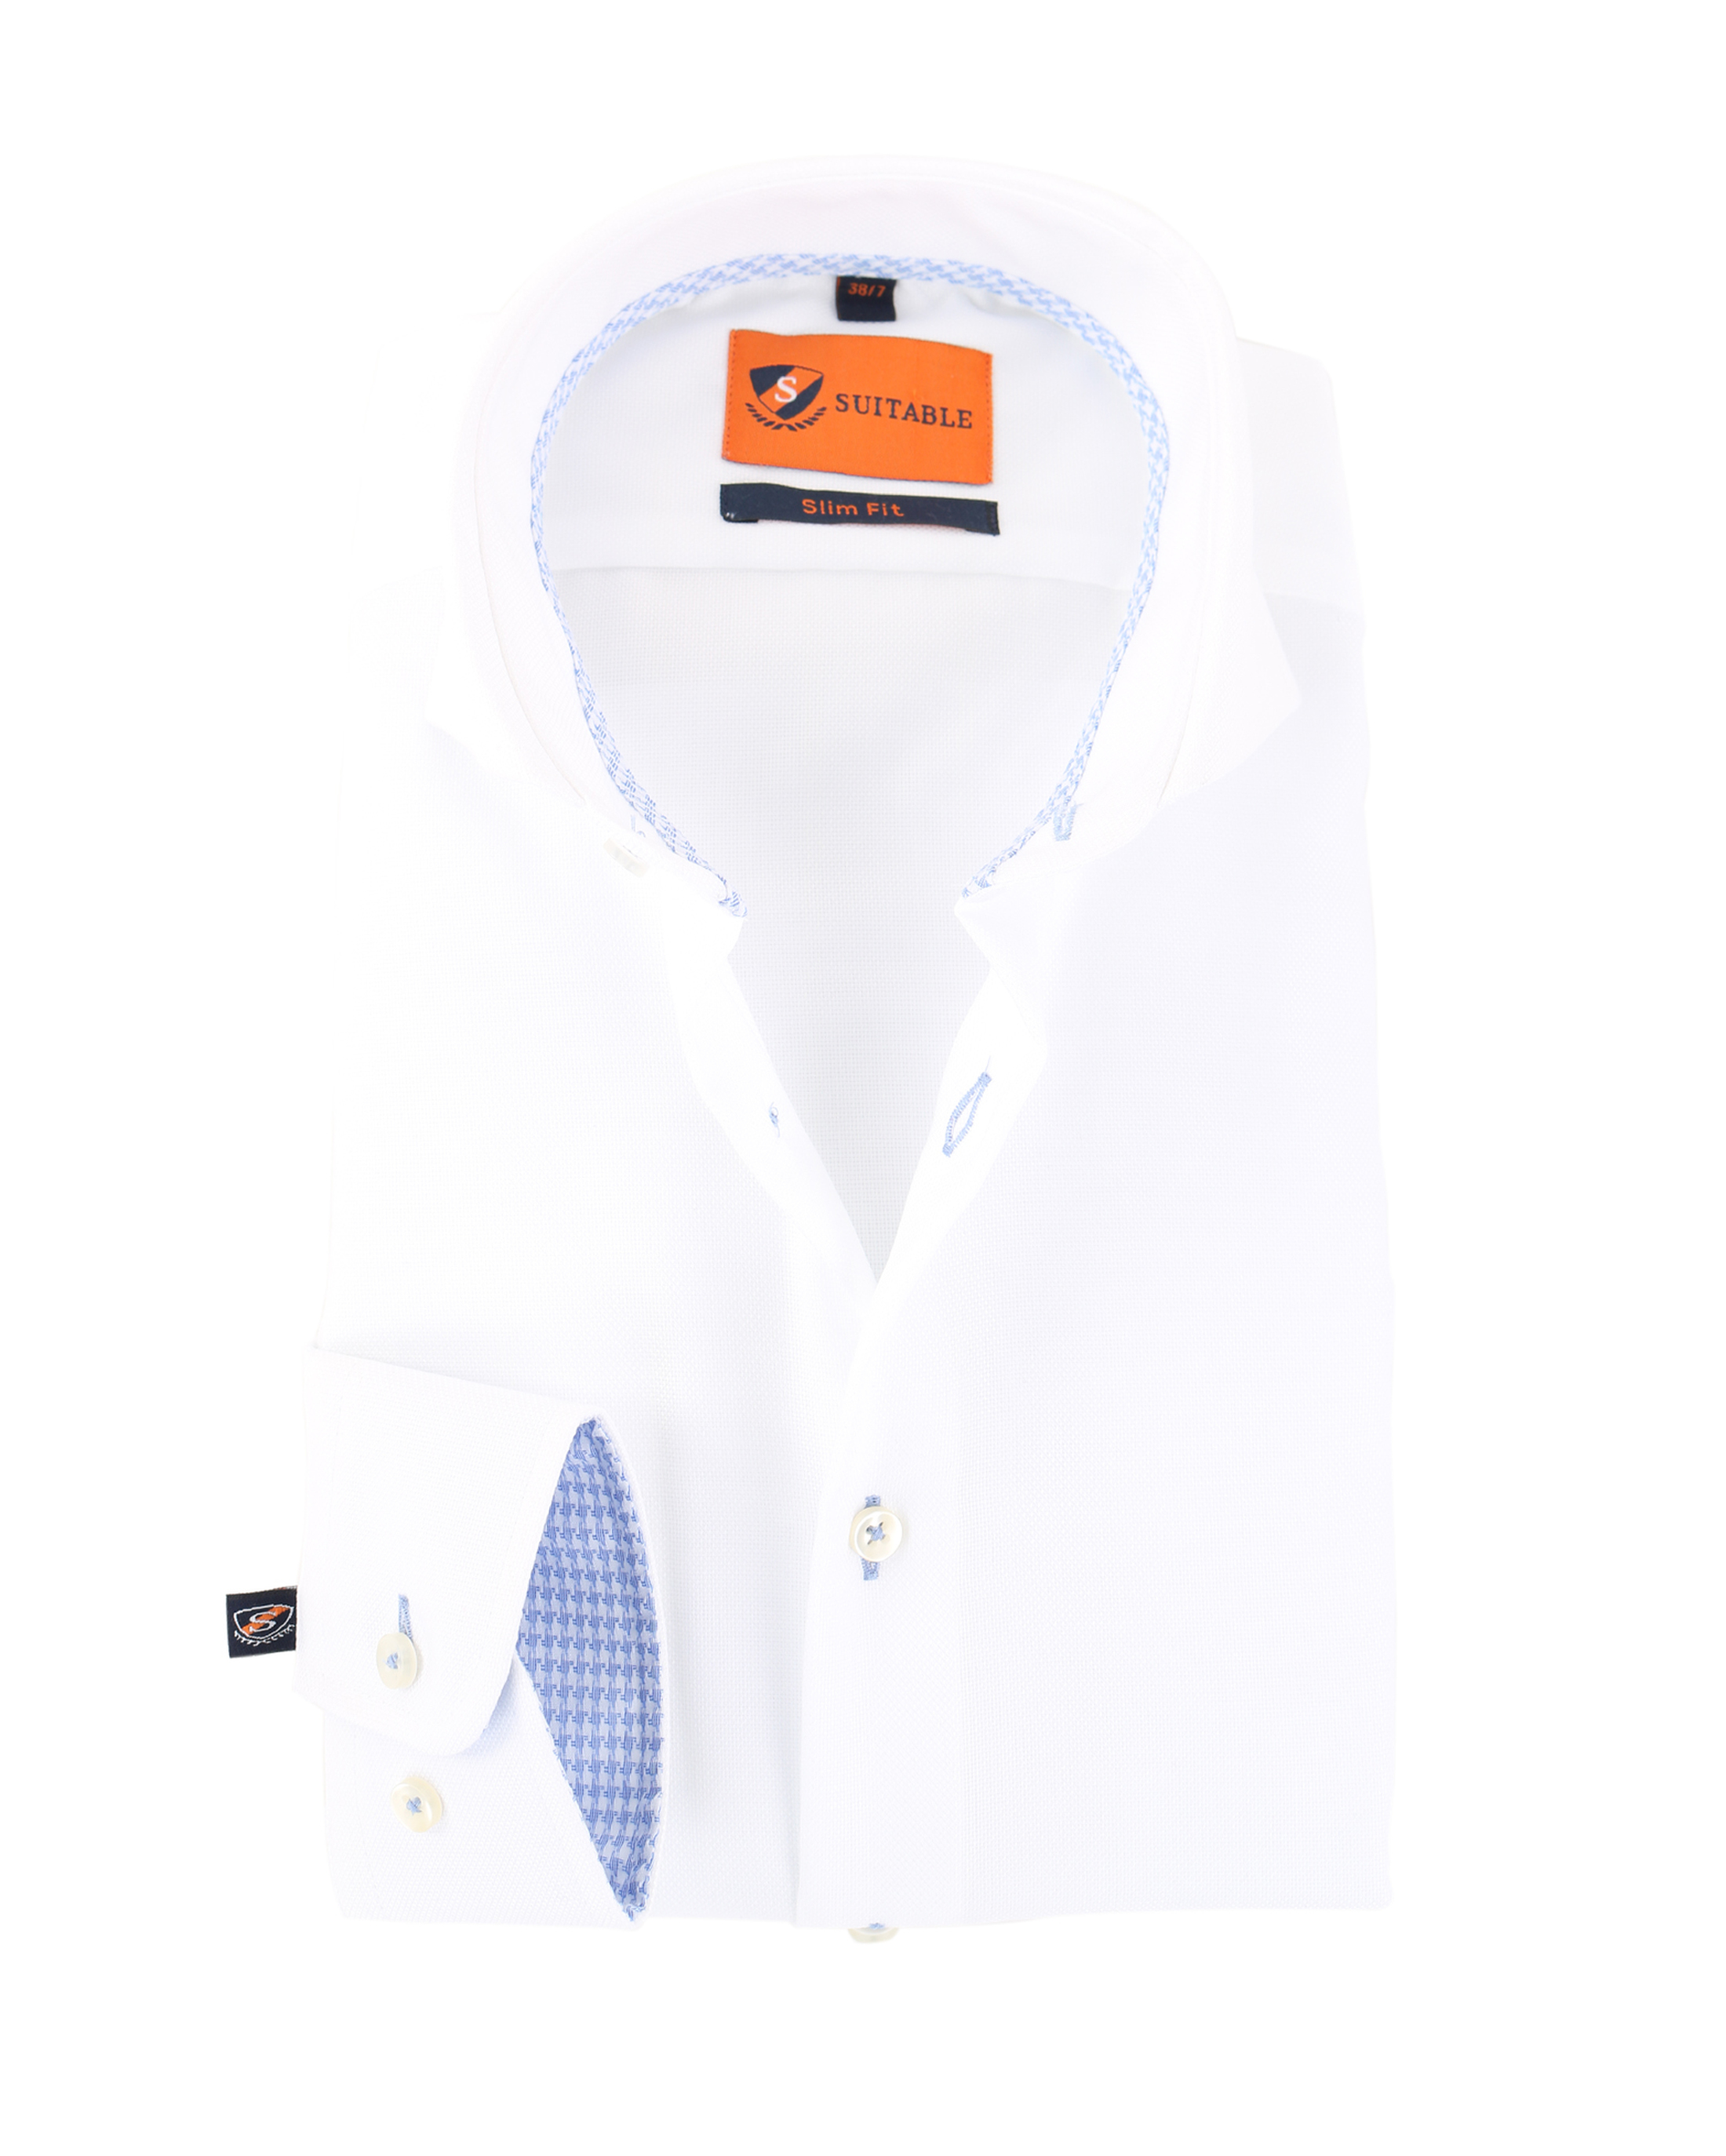 Mouwlengte 7 Overhemd Wit 150-1 foto 0